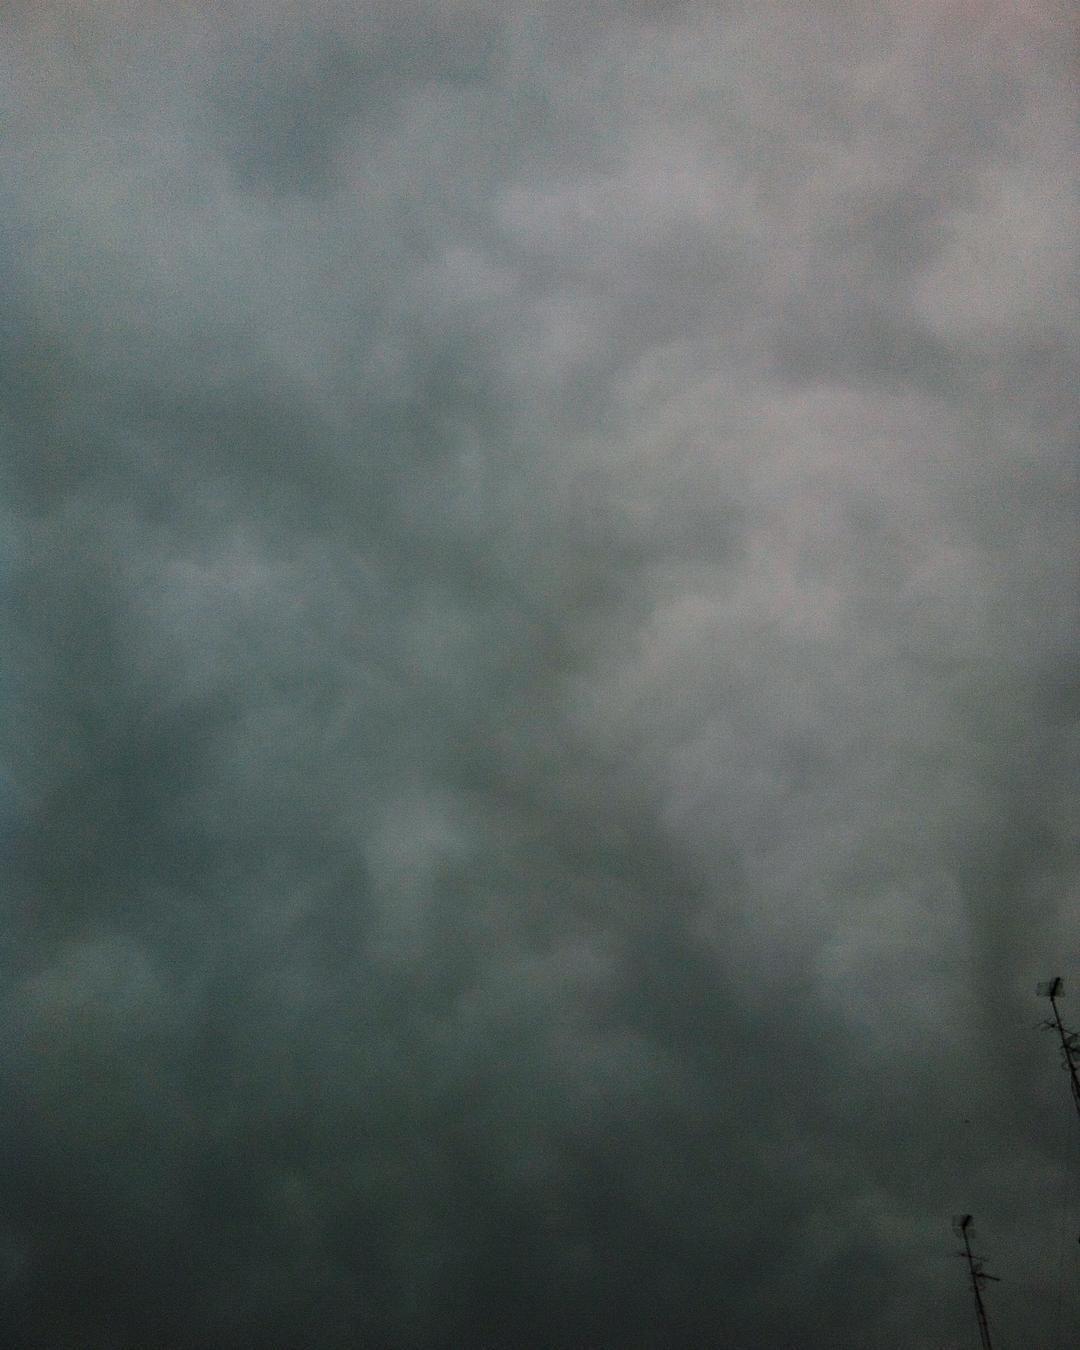 El cielo de #Valencia hoy panza de burro. by verlanga_com